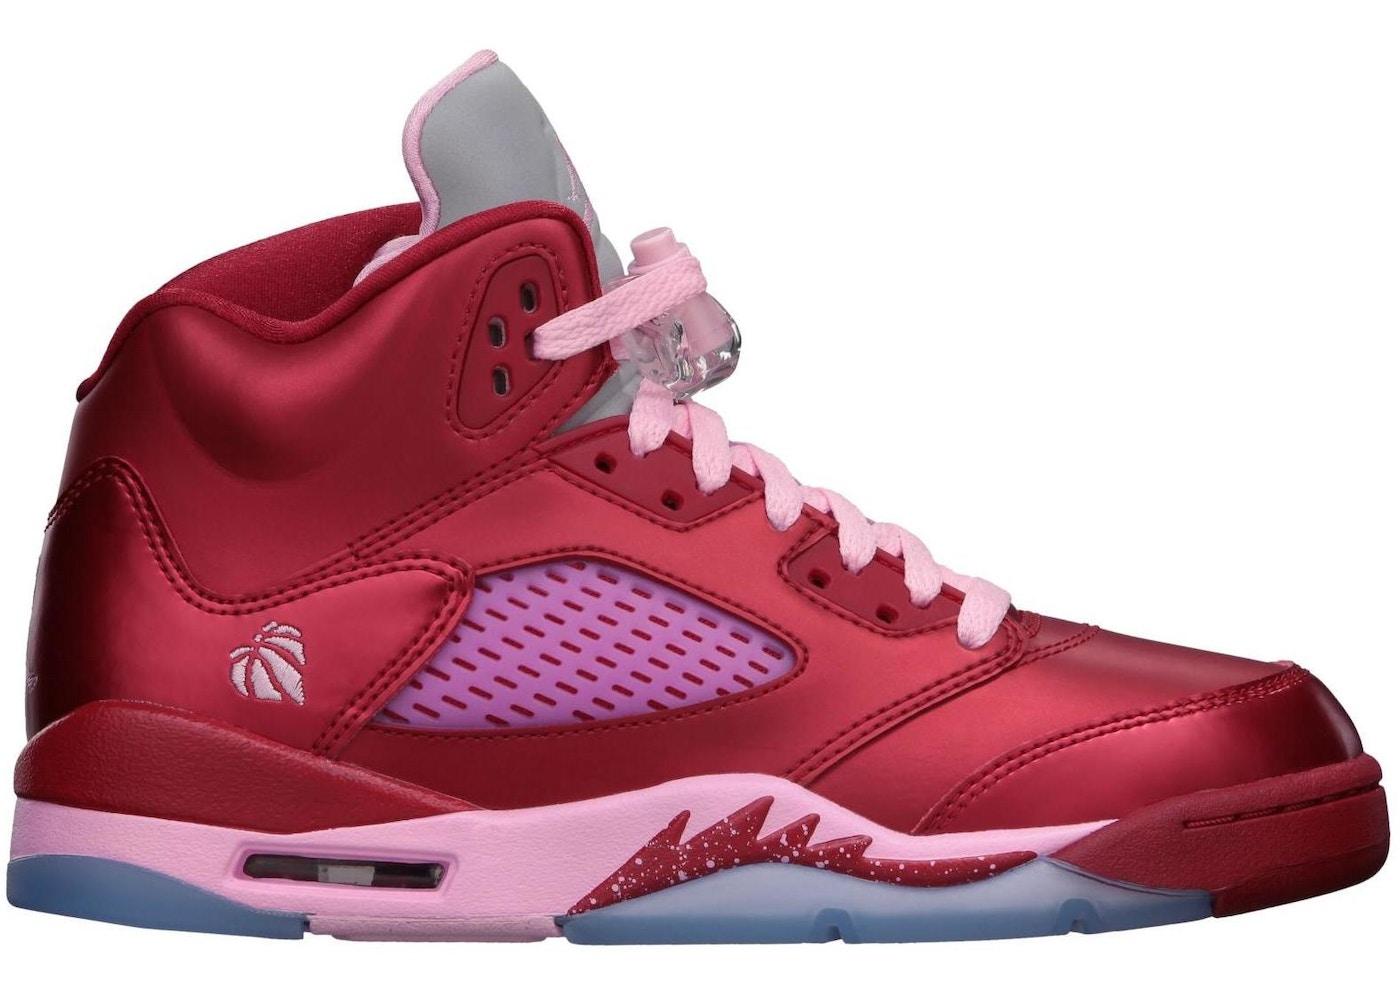 7abeb74893bf Jordan 5 Retro Valentines Day (GS) - 440892-605